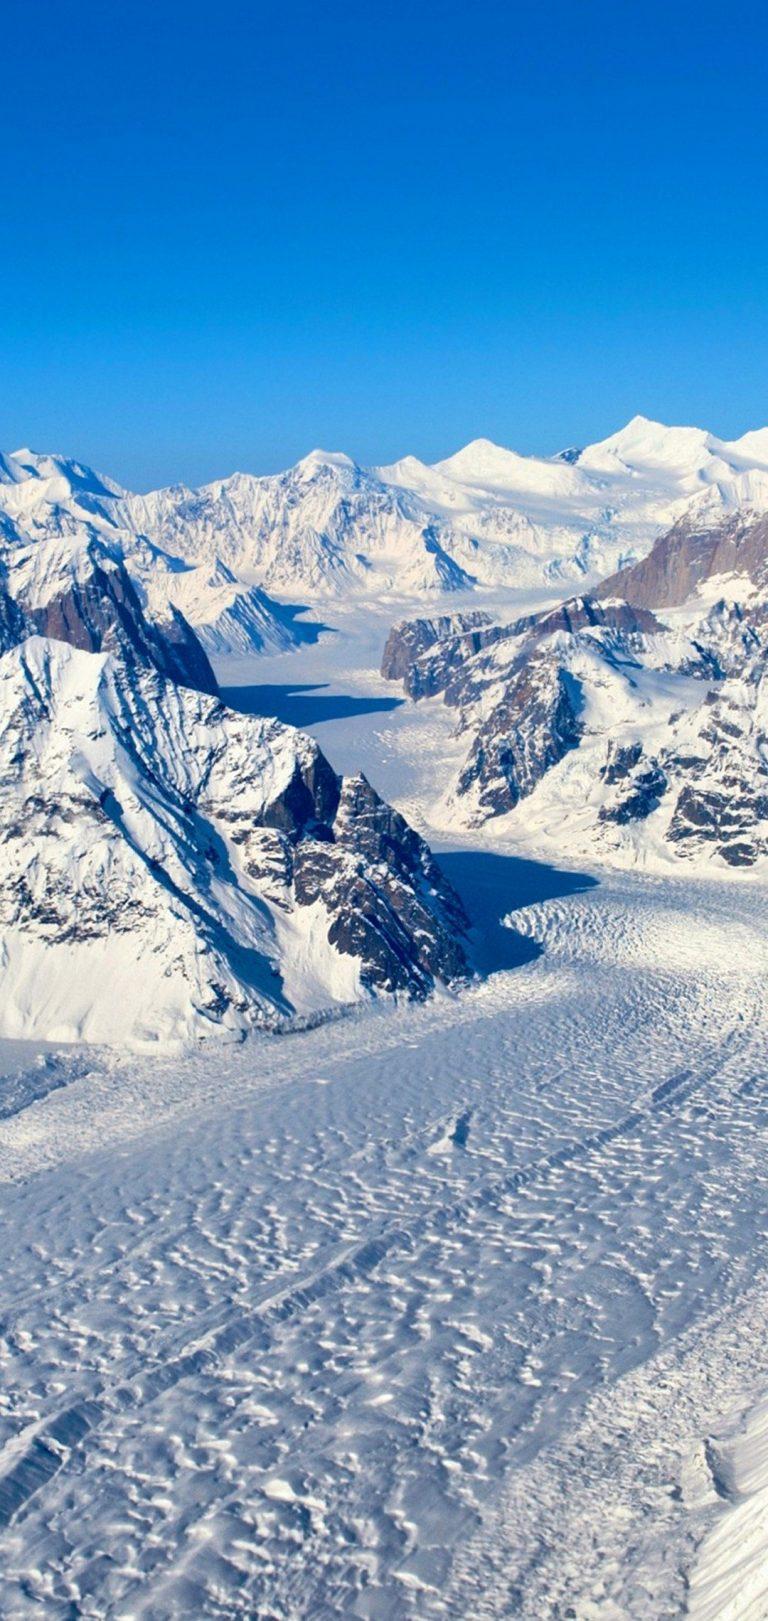 Winter Mountain Wallpaper 1080x2280 768x1621